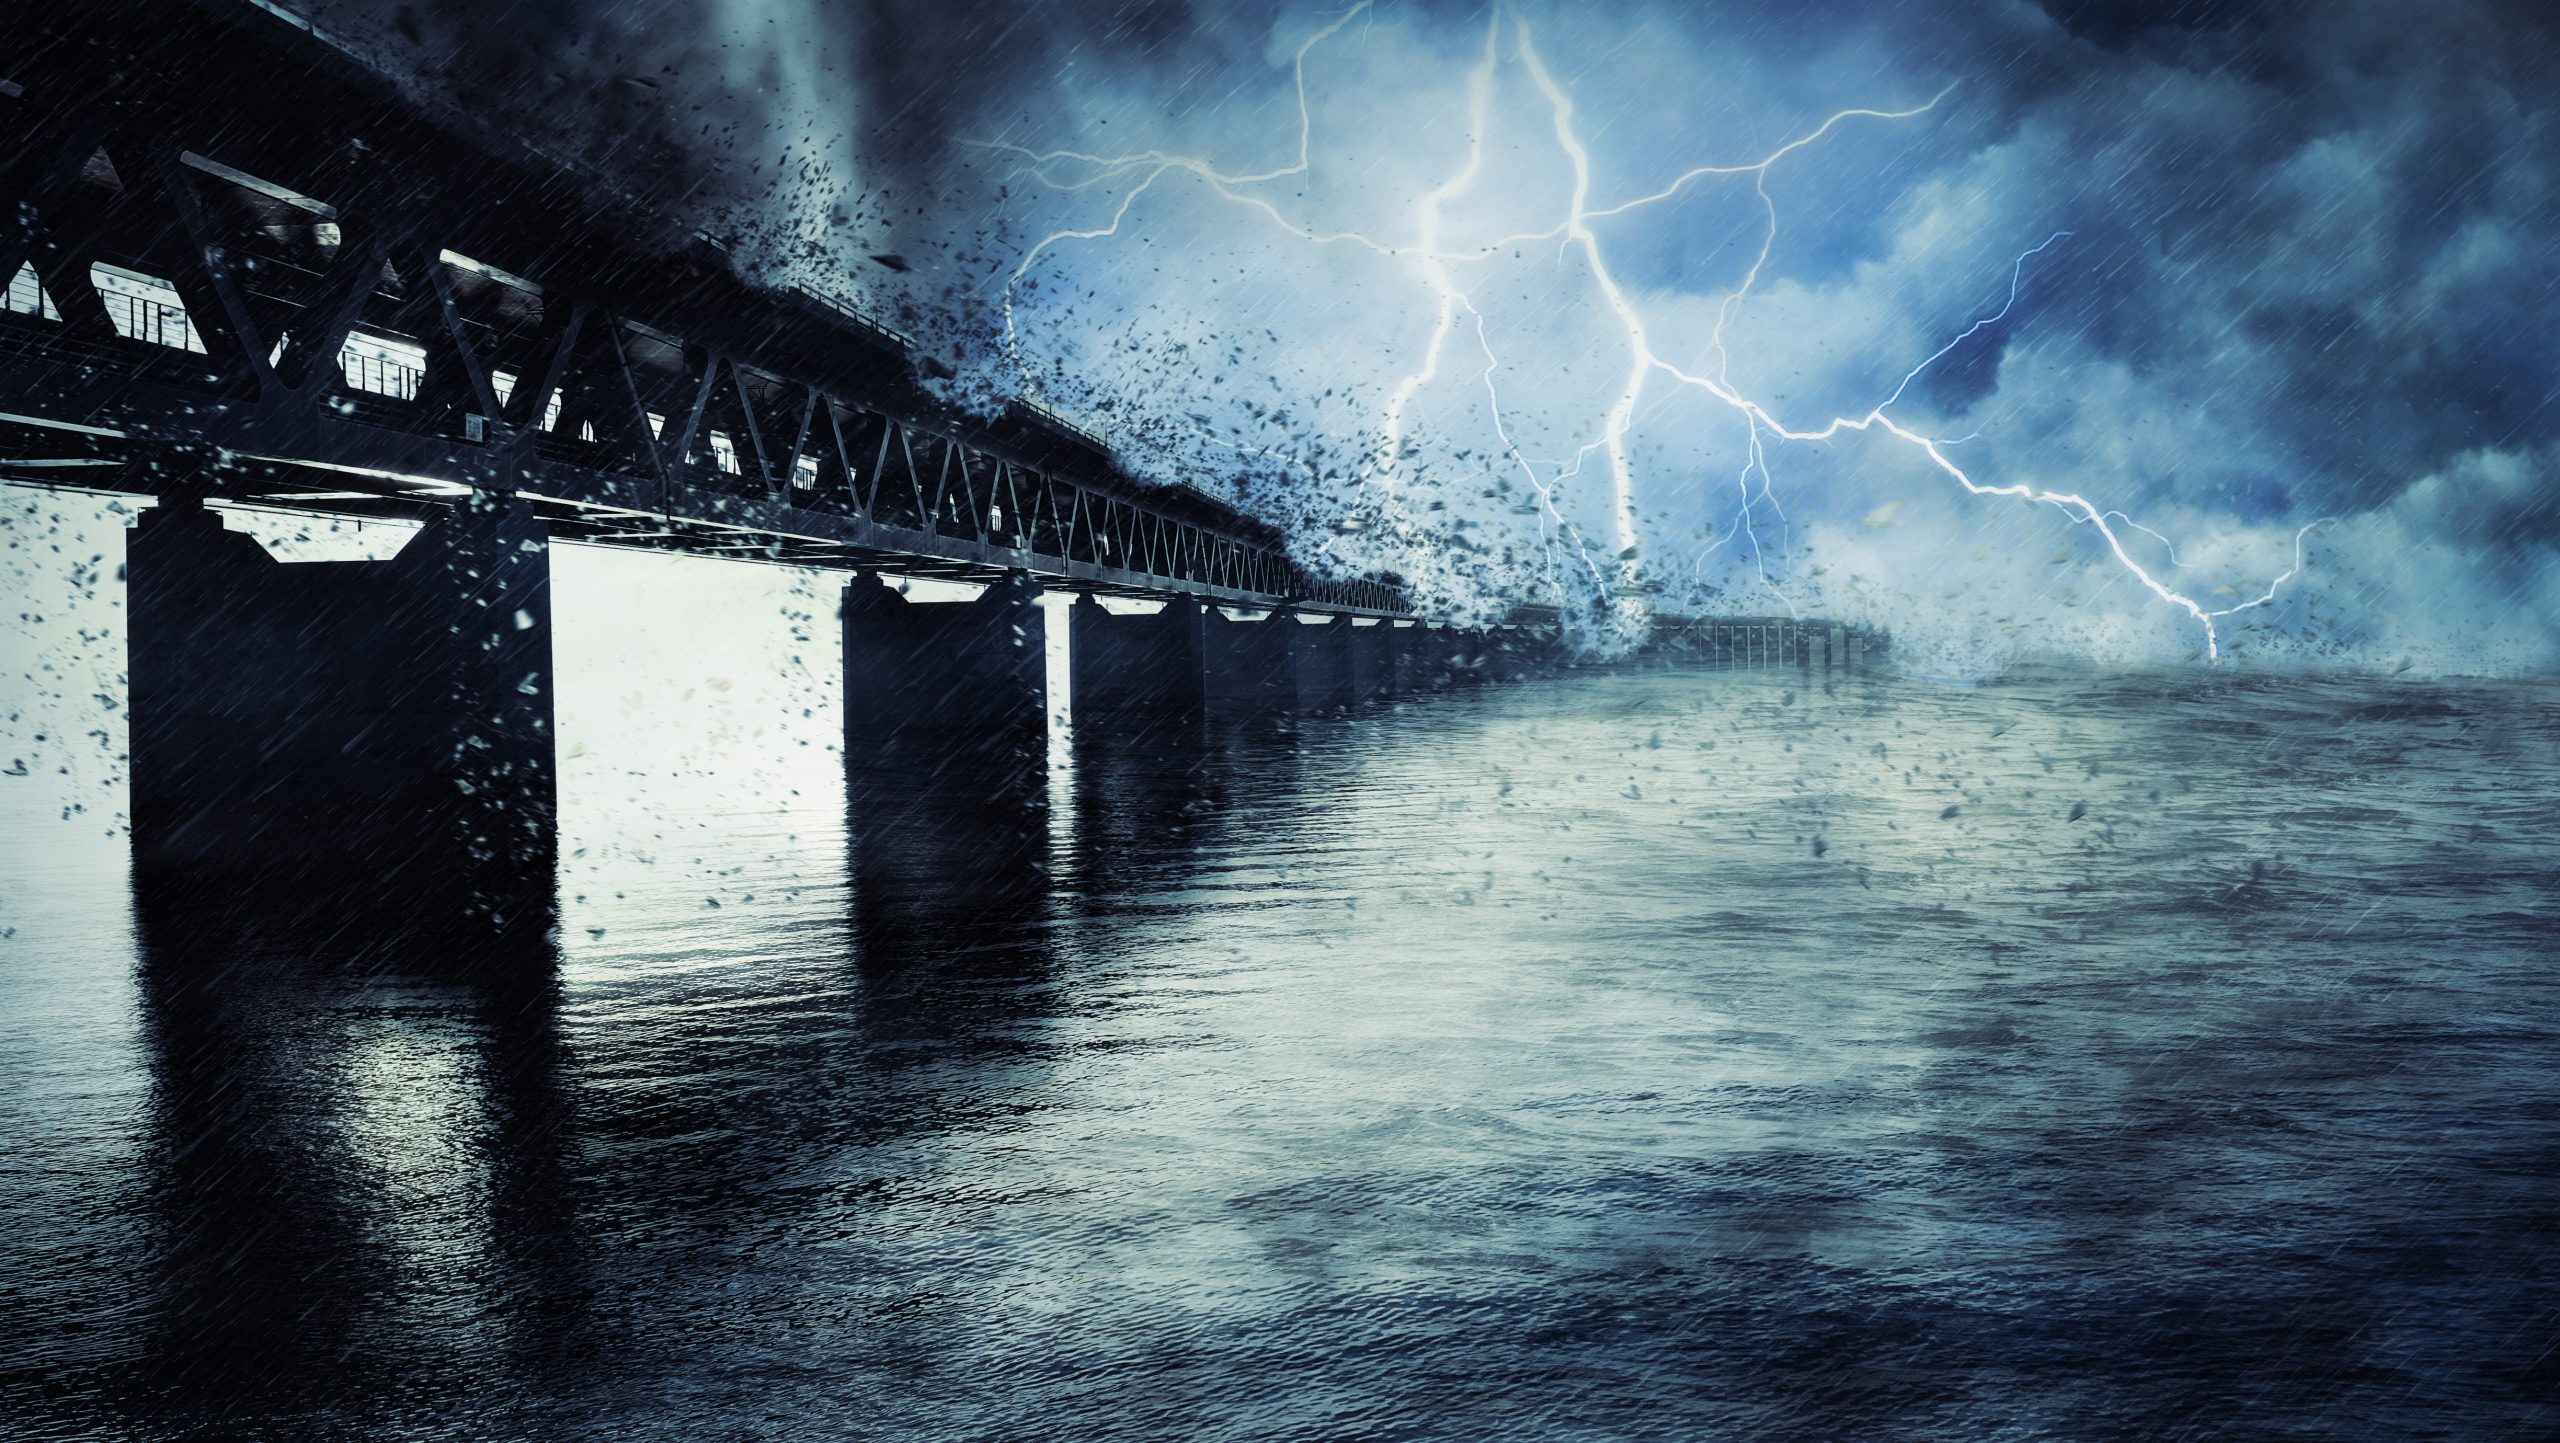 Thunderstorm near a bridge